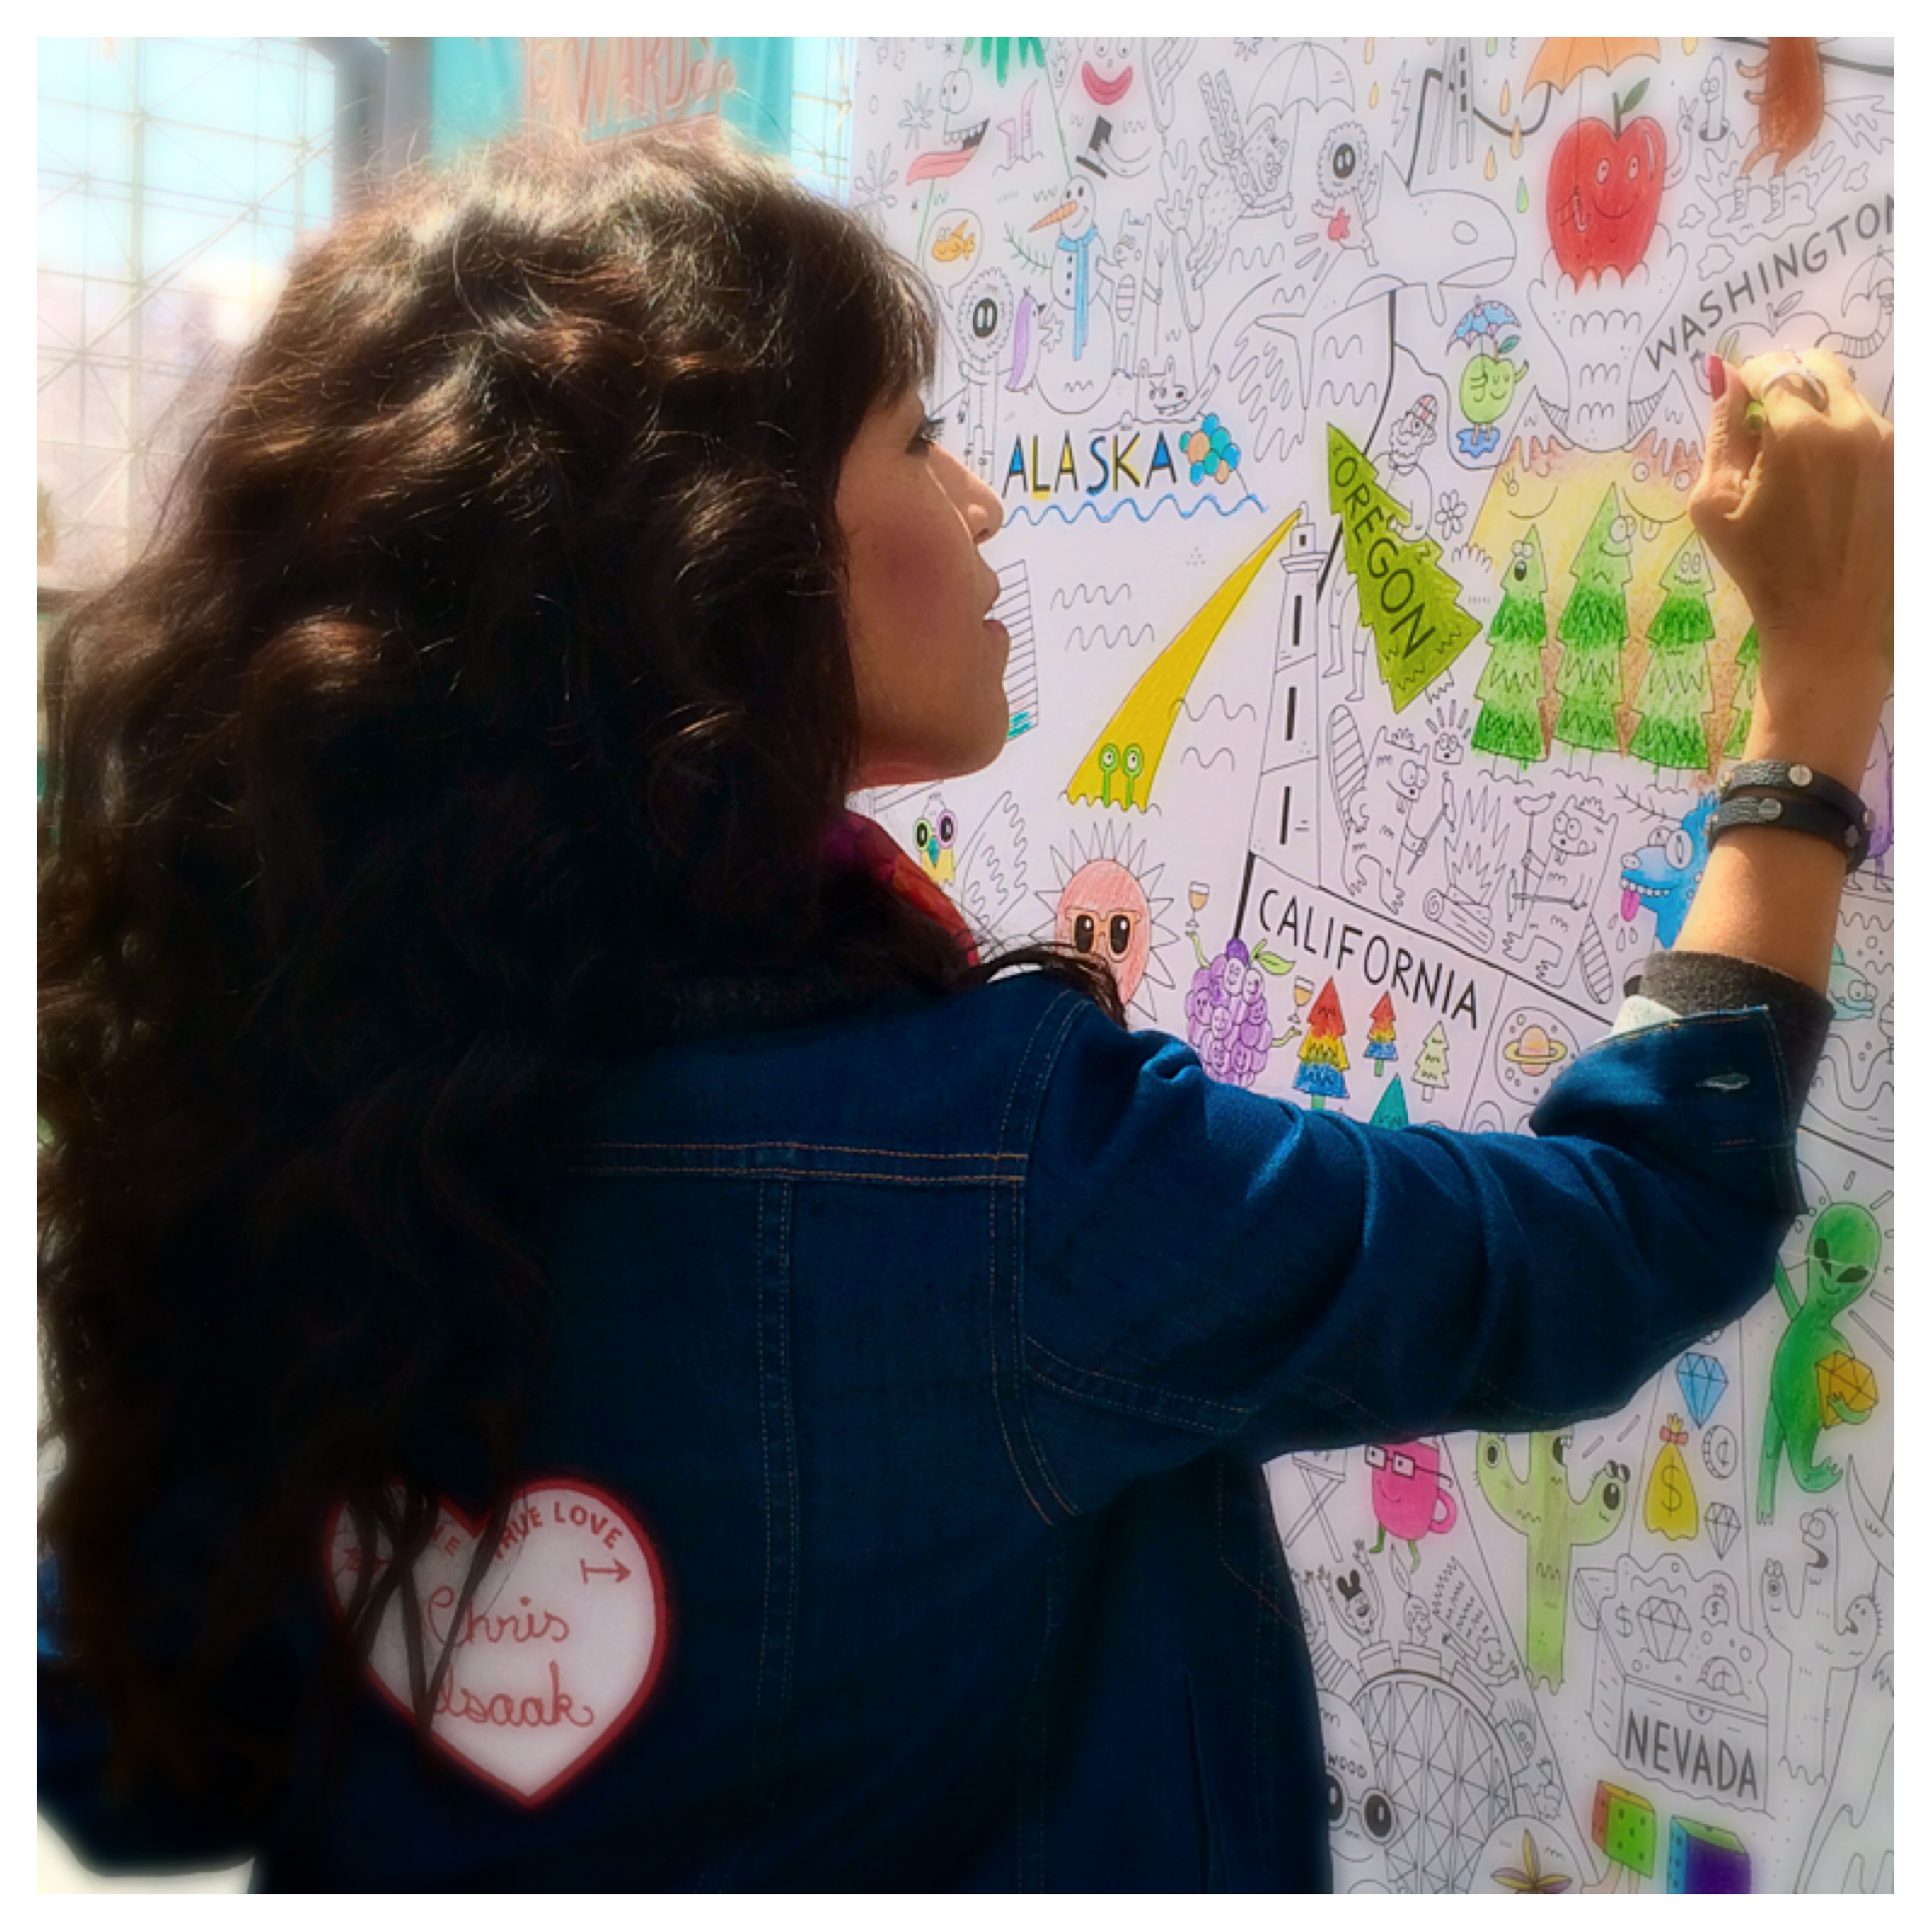 Dionne making her Mark at Surtex, Javits Center, NY, NY.